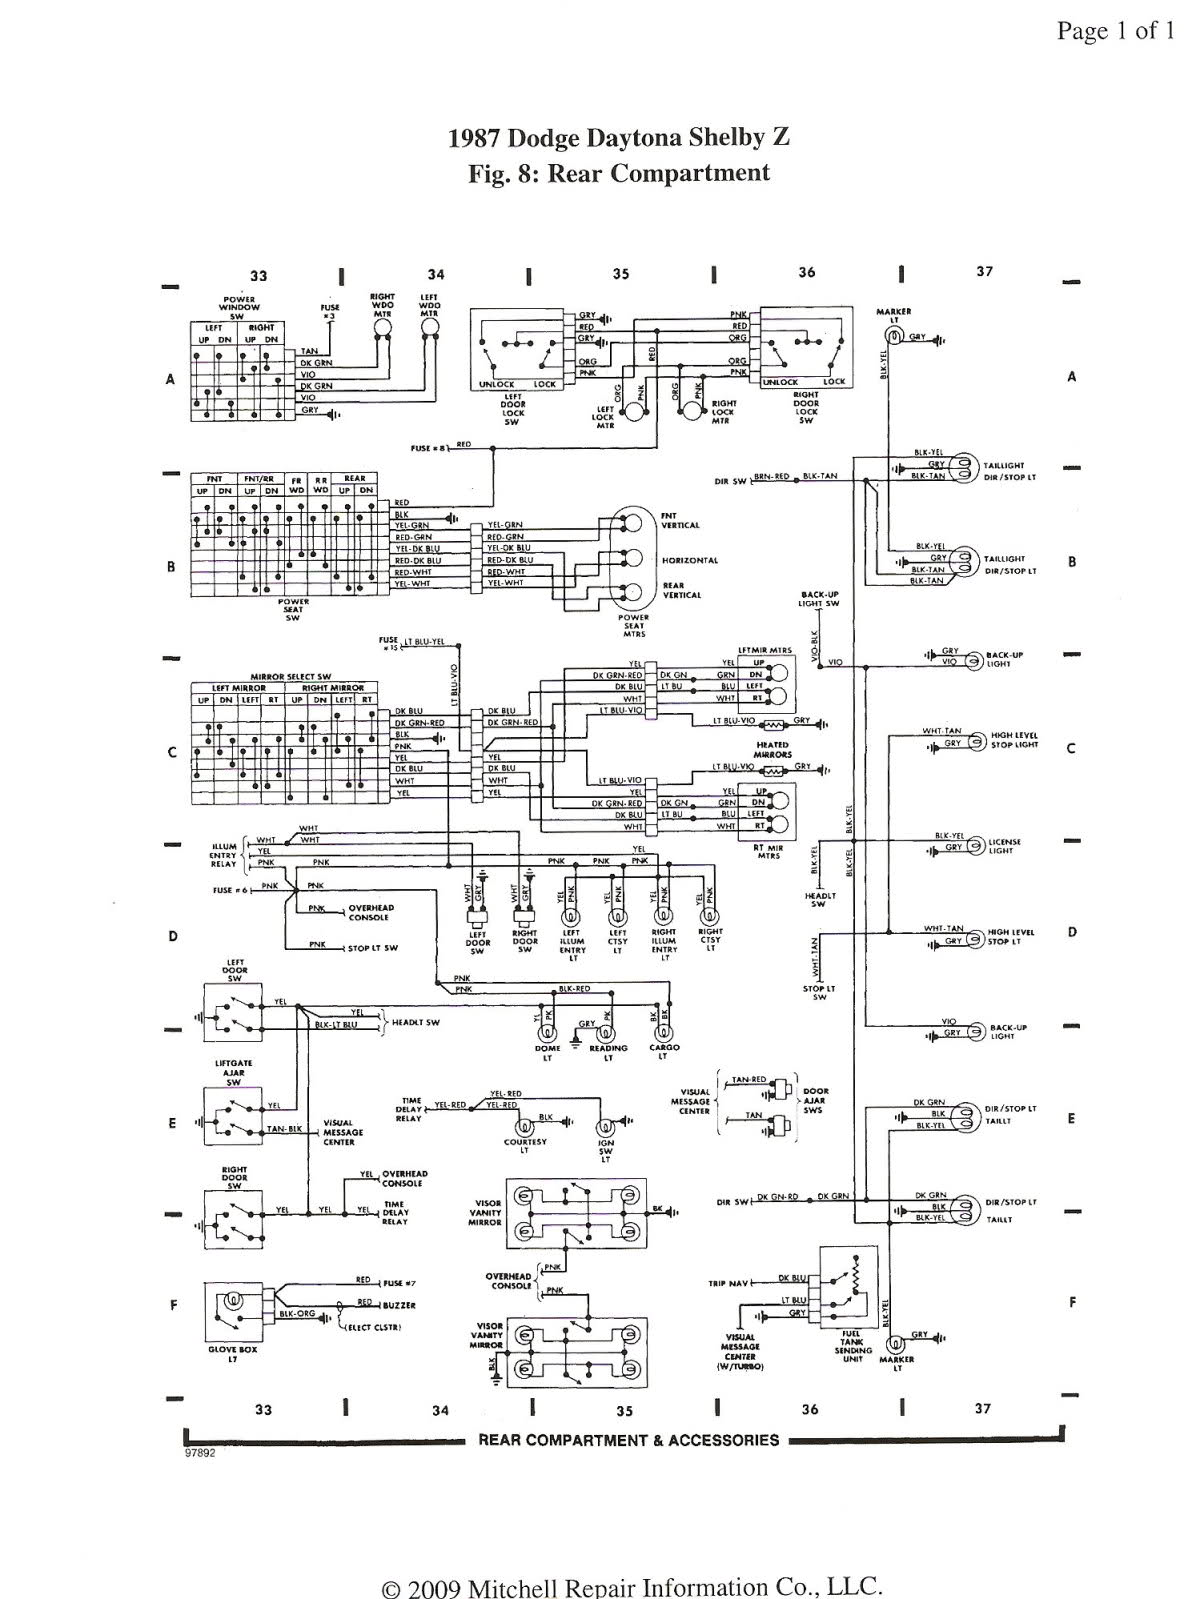 95 dodge ram 1500 radio wiring diagram dish network multiswitch 2500 stereo get free image